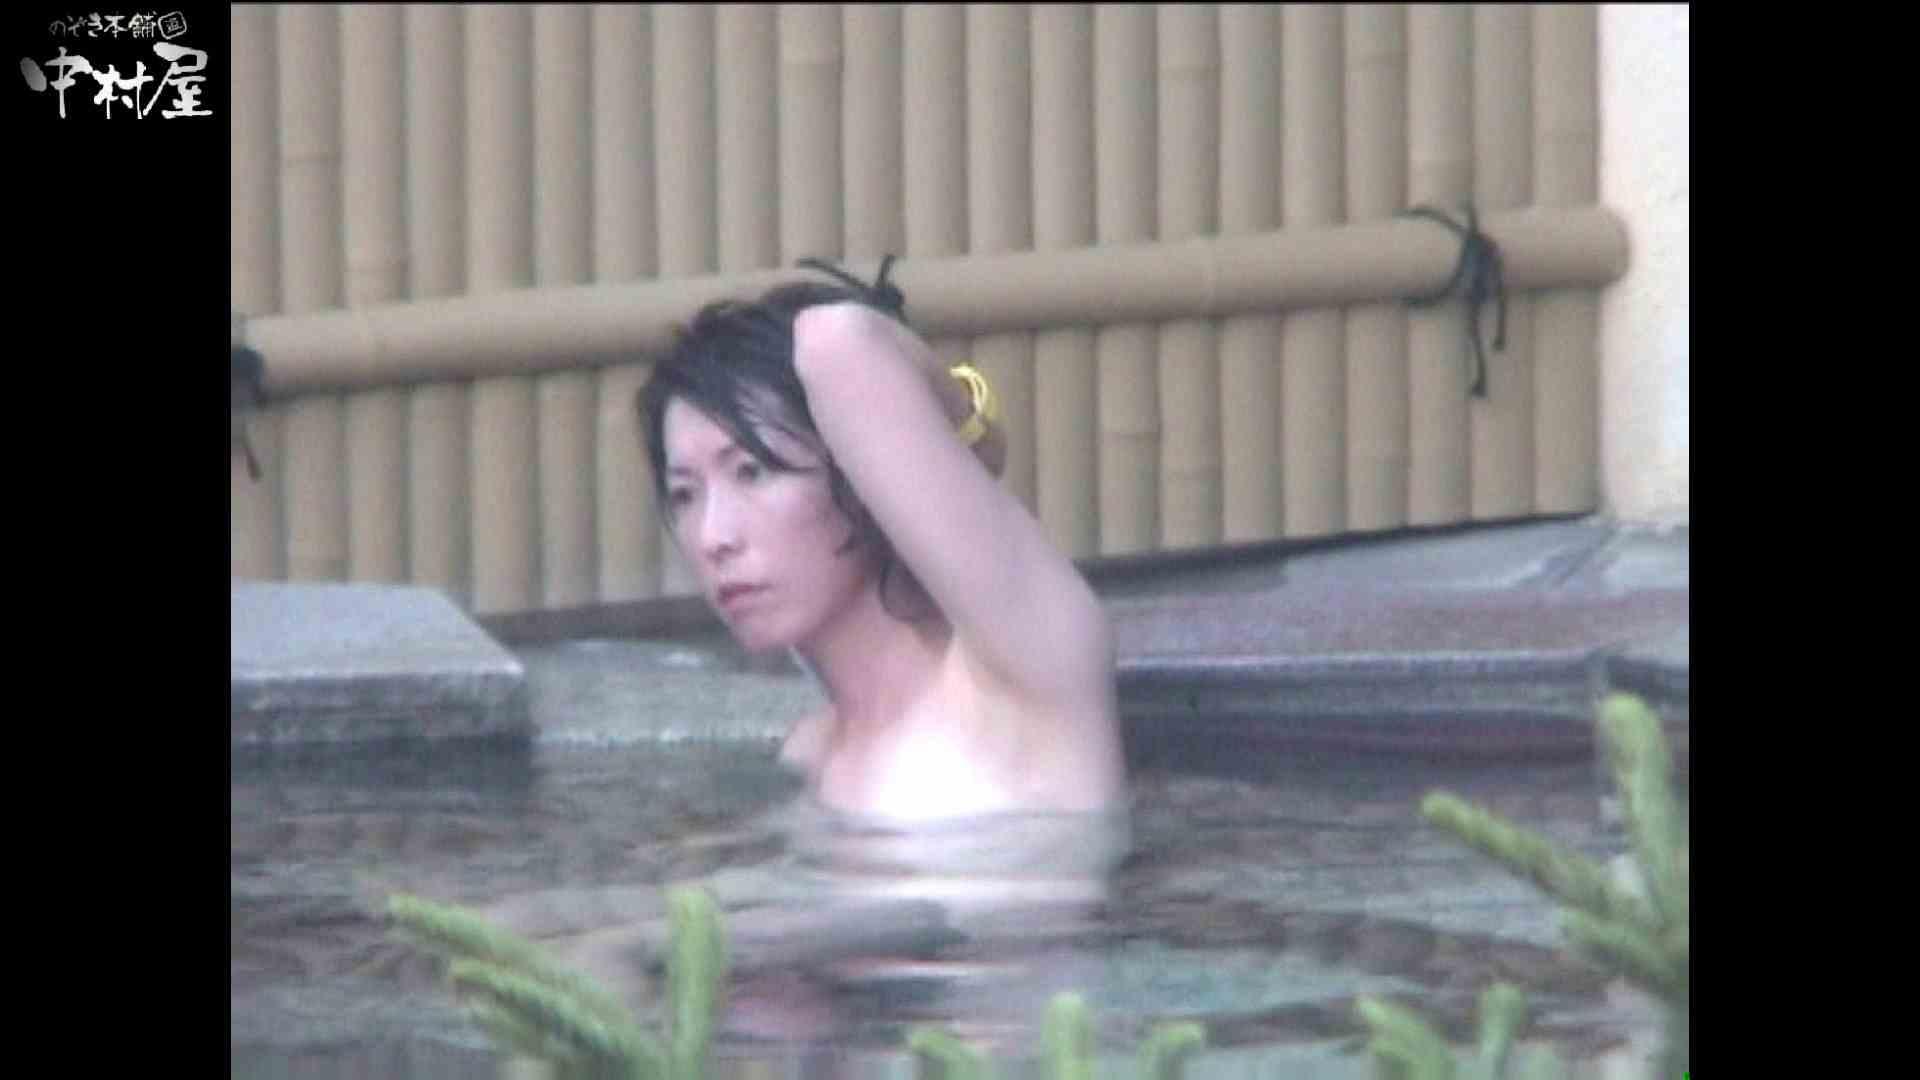 Aquaな露天風呂Vol.987 0 | 0  61連発 15